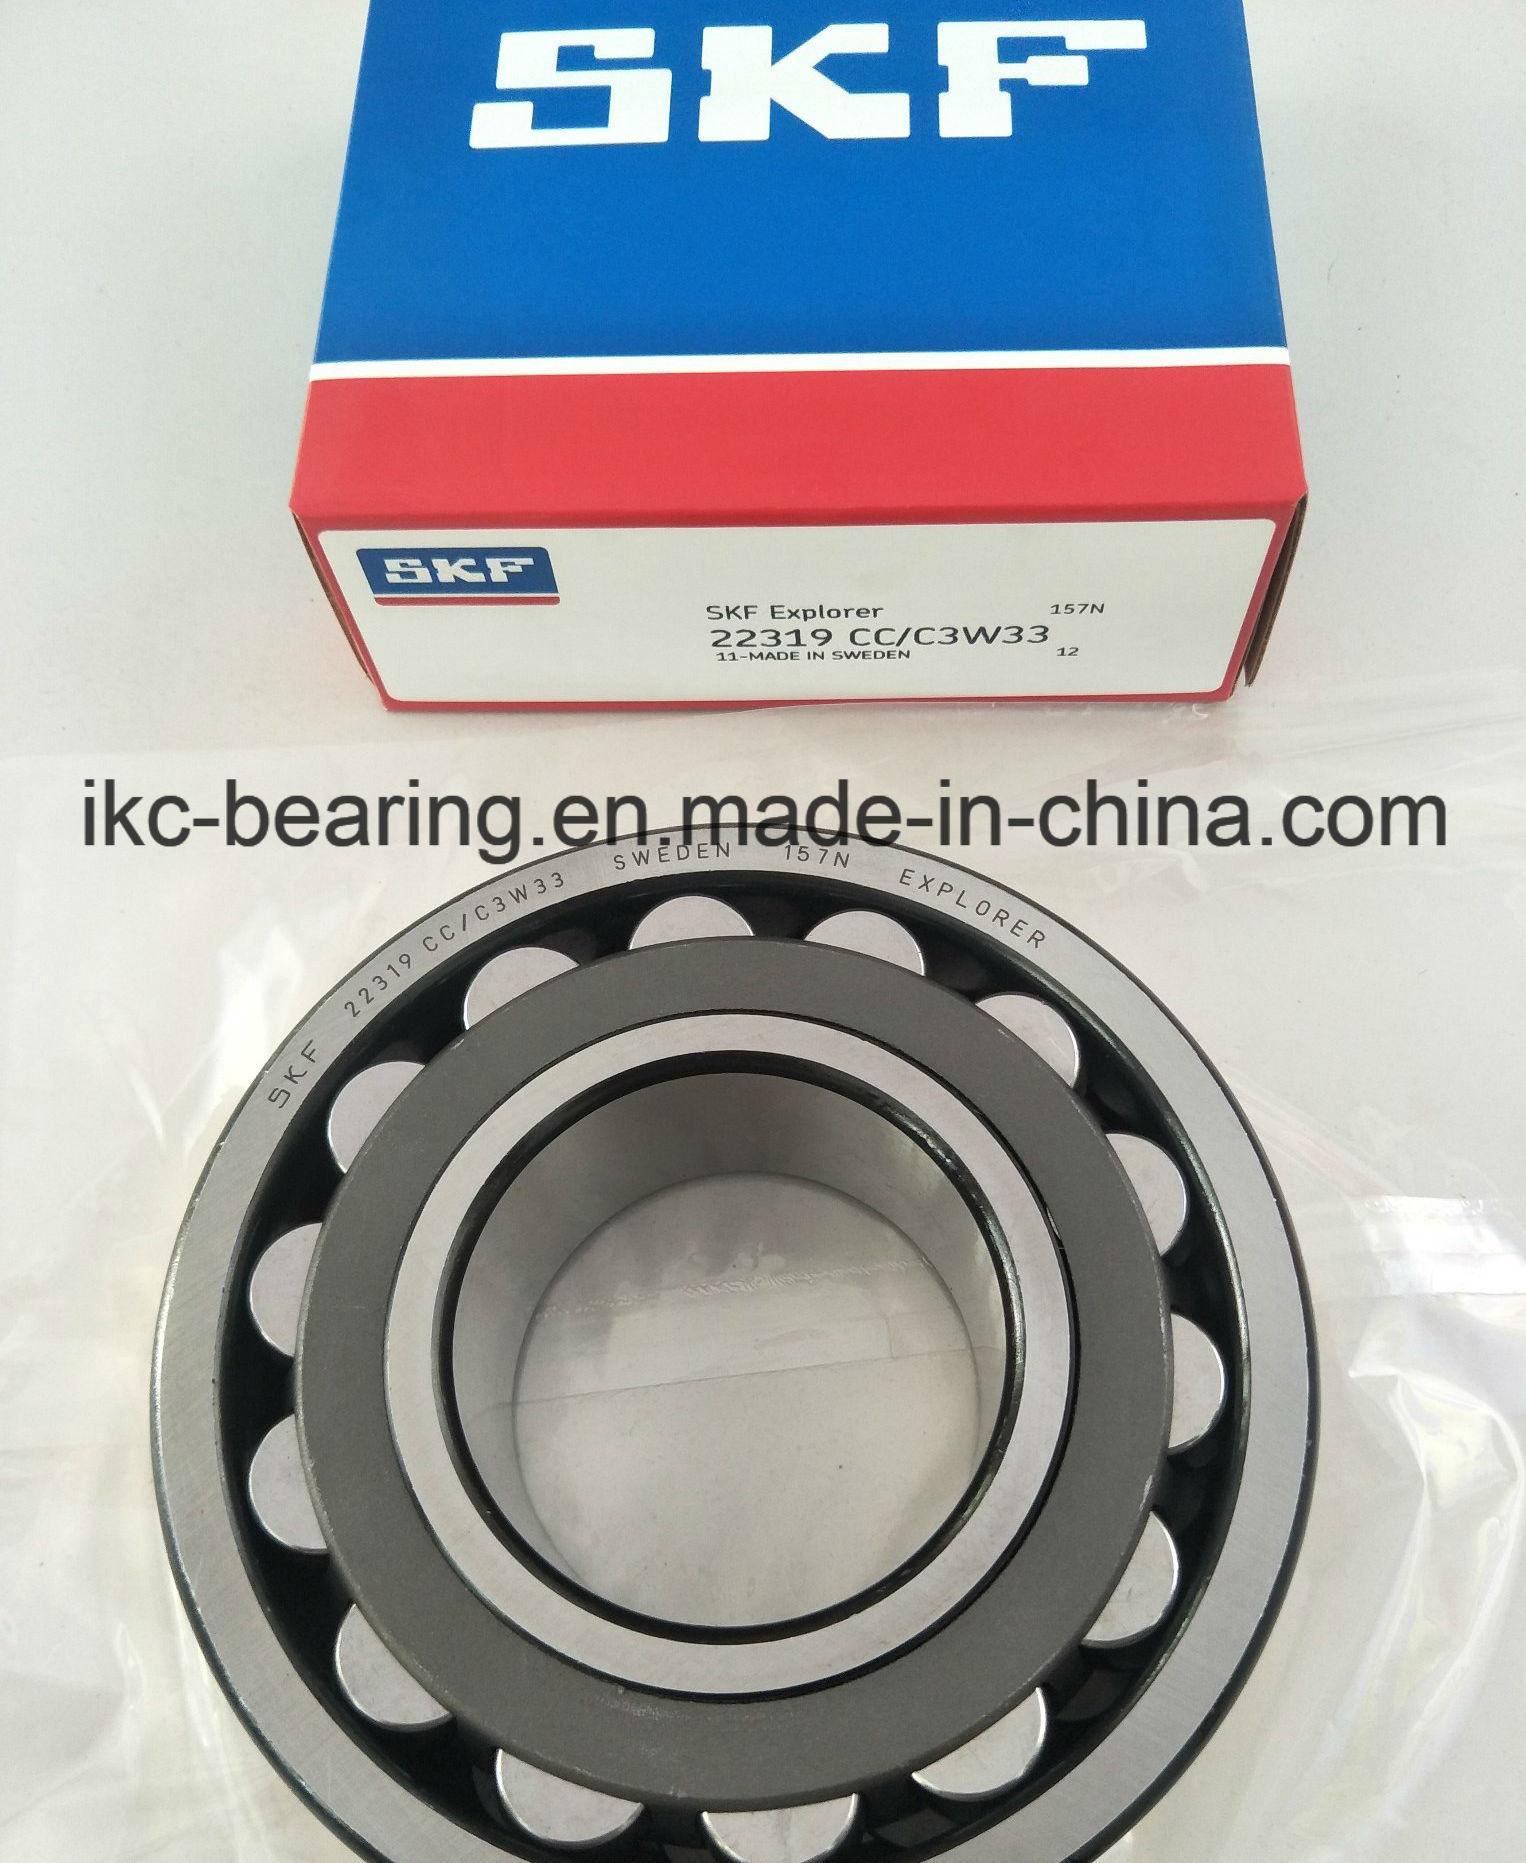 China SKF 22319cc/C3w33, 22319cc/W33/C3 Spherical Roller Bearings 22319ek,  22319ck, 22319K - China 22319cc/C3w33 Bearings 22320cc/C3w33 Bearings, ...